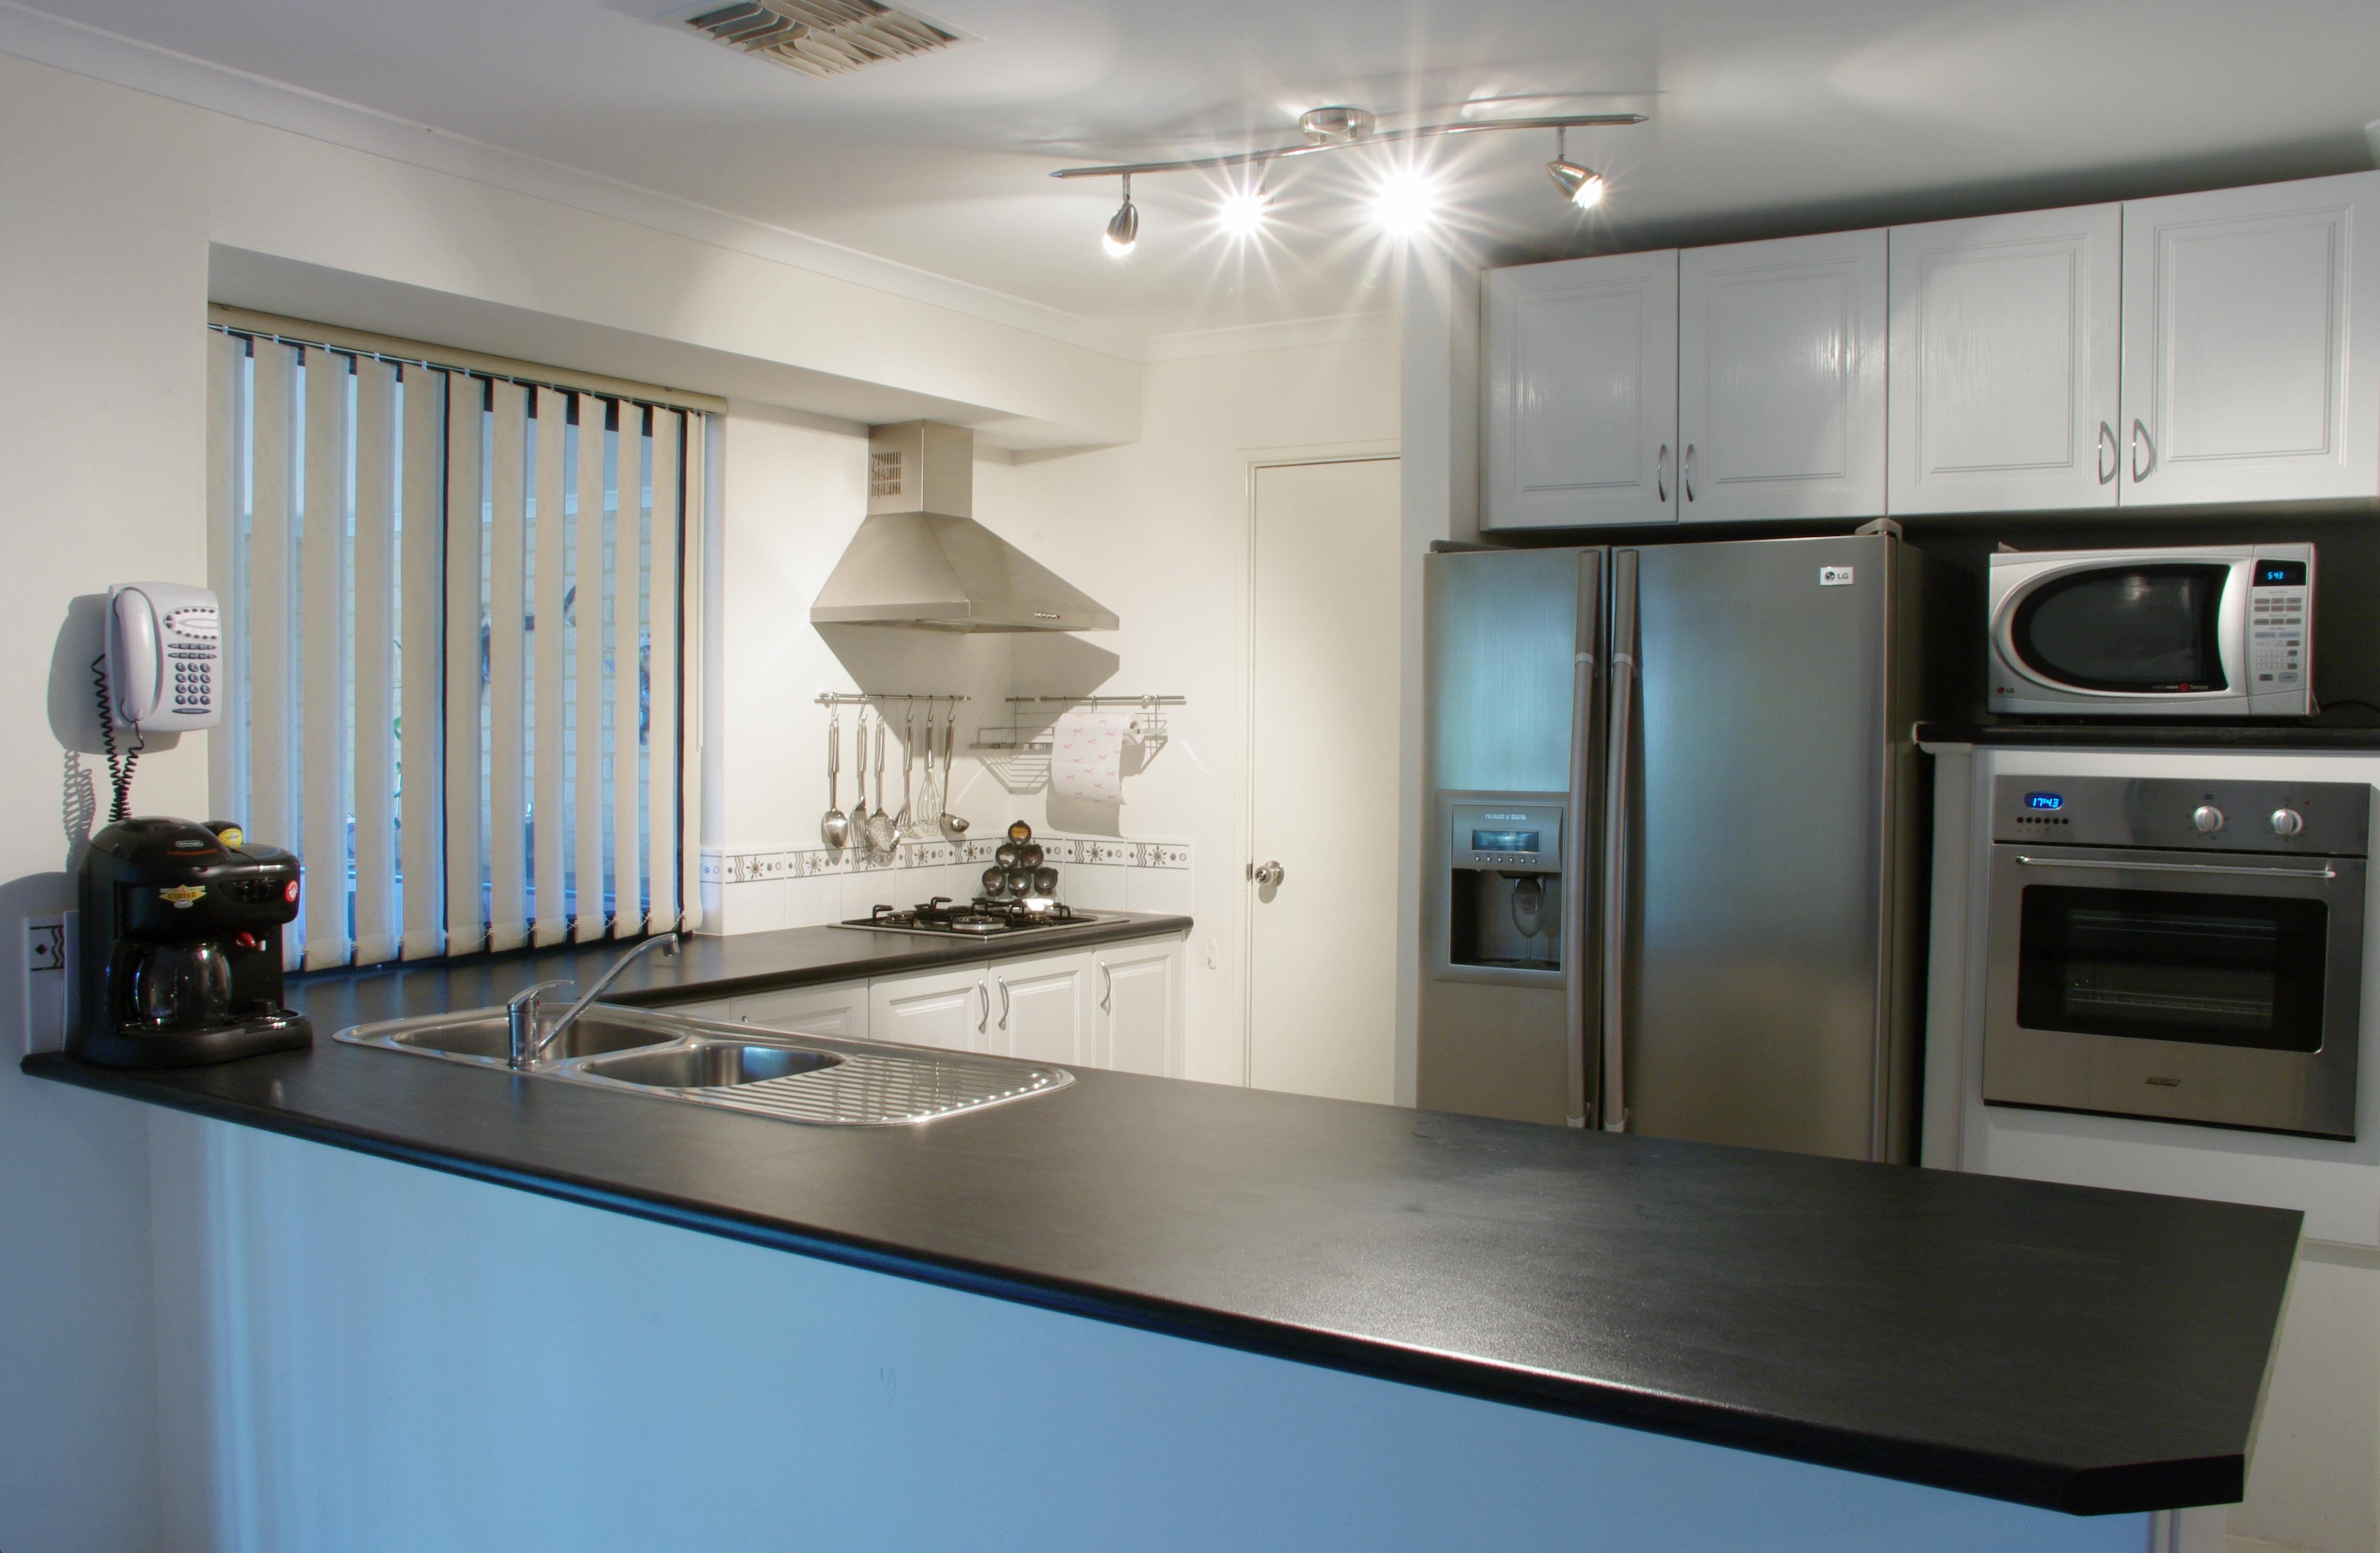 Top 10 Modern Kitchen Ceiling Lights